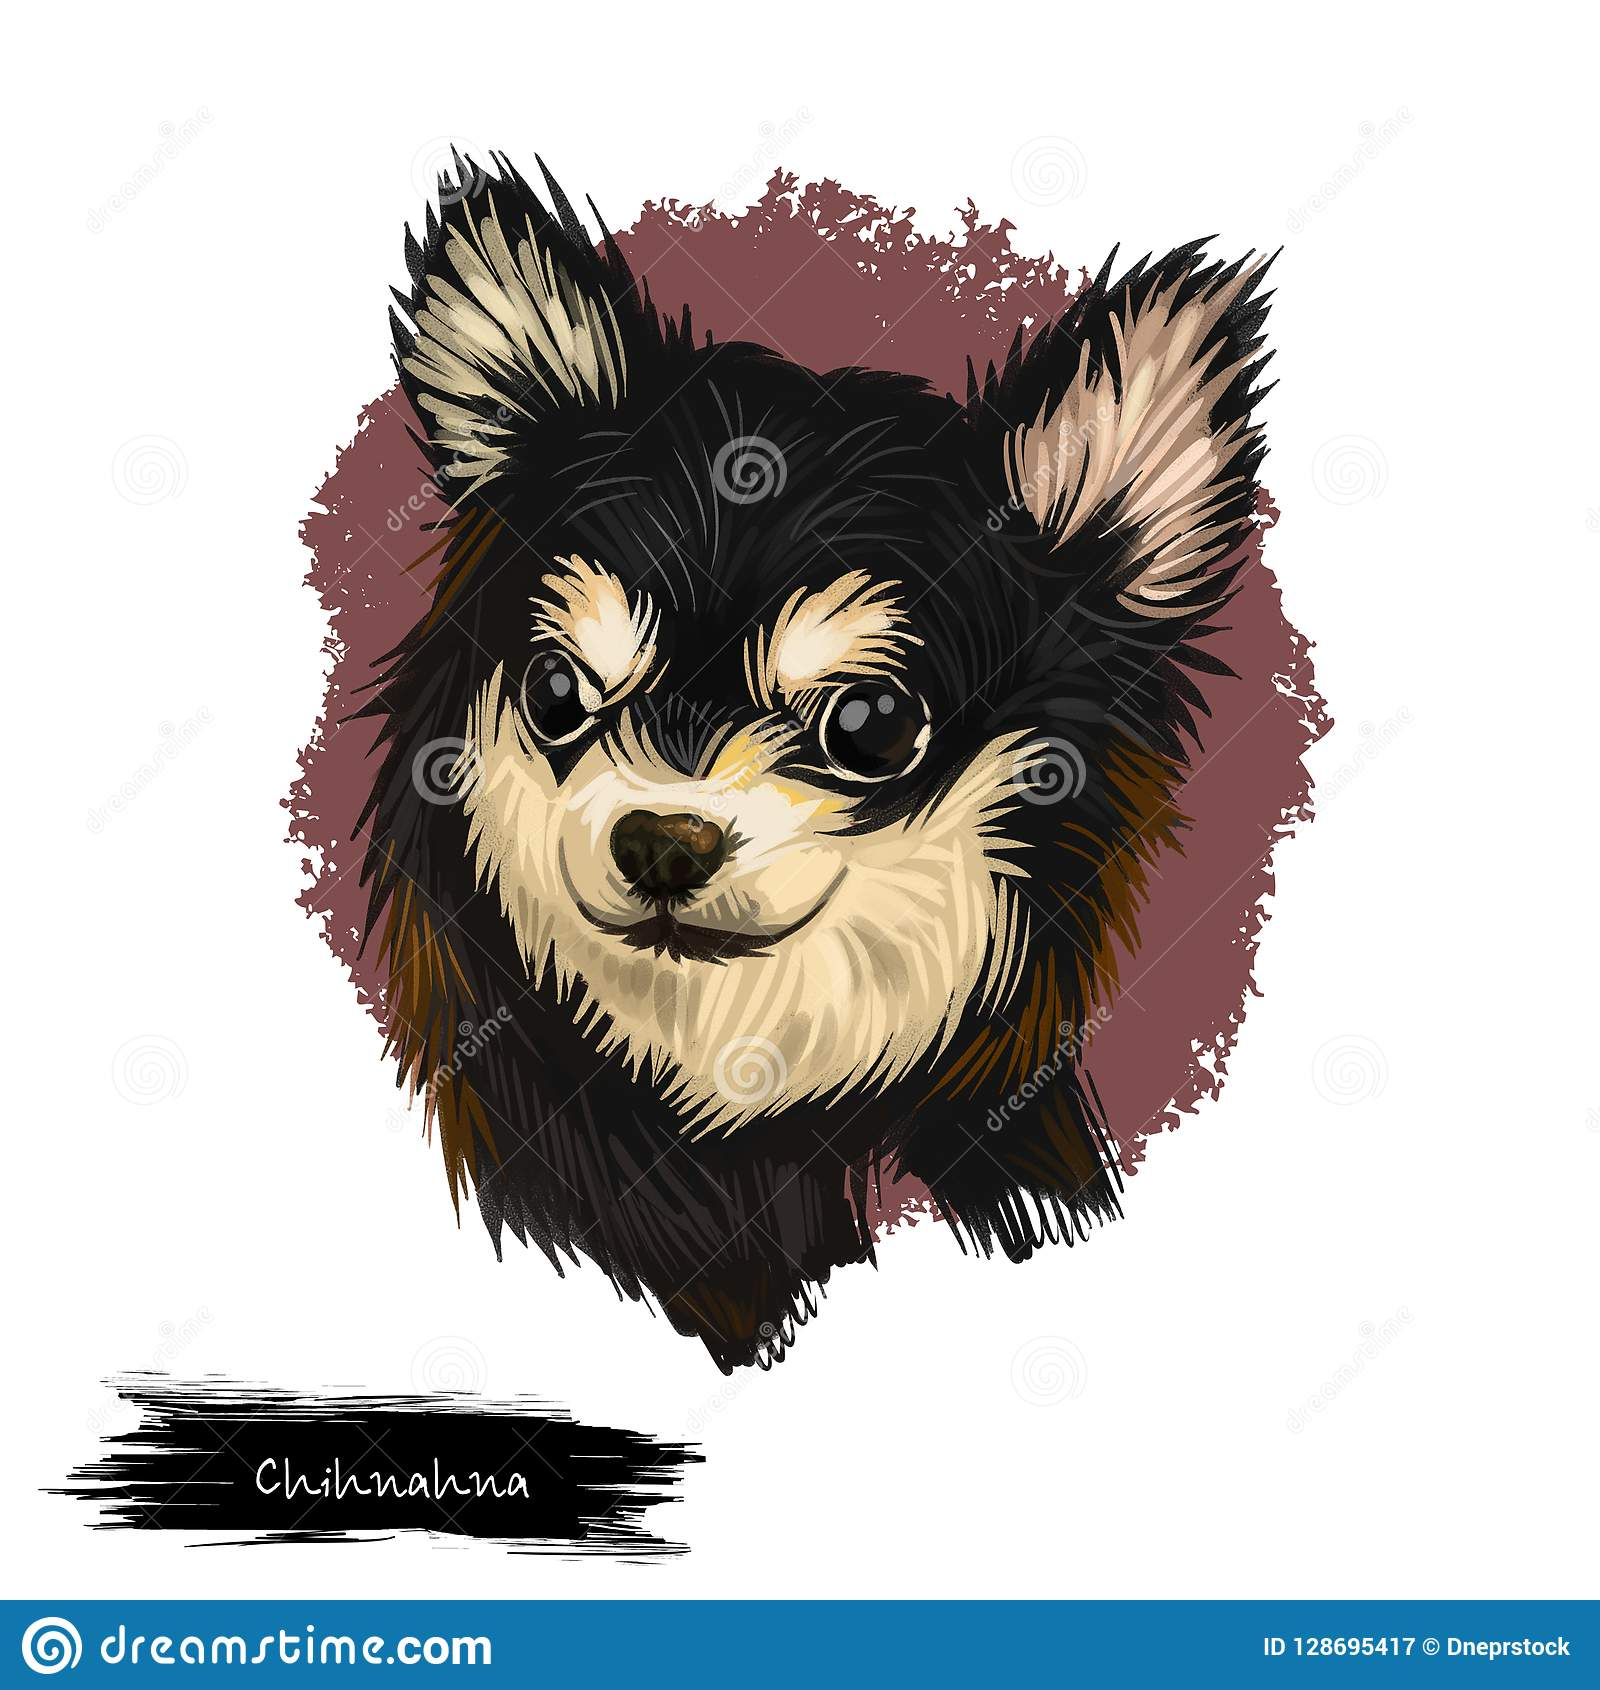 Chihuahua Dog Breed Isolated On White Background Digital Art